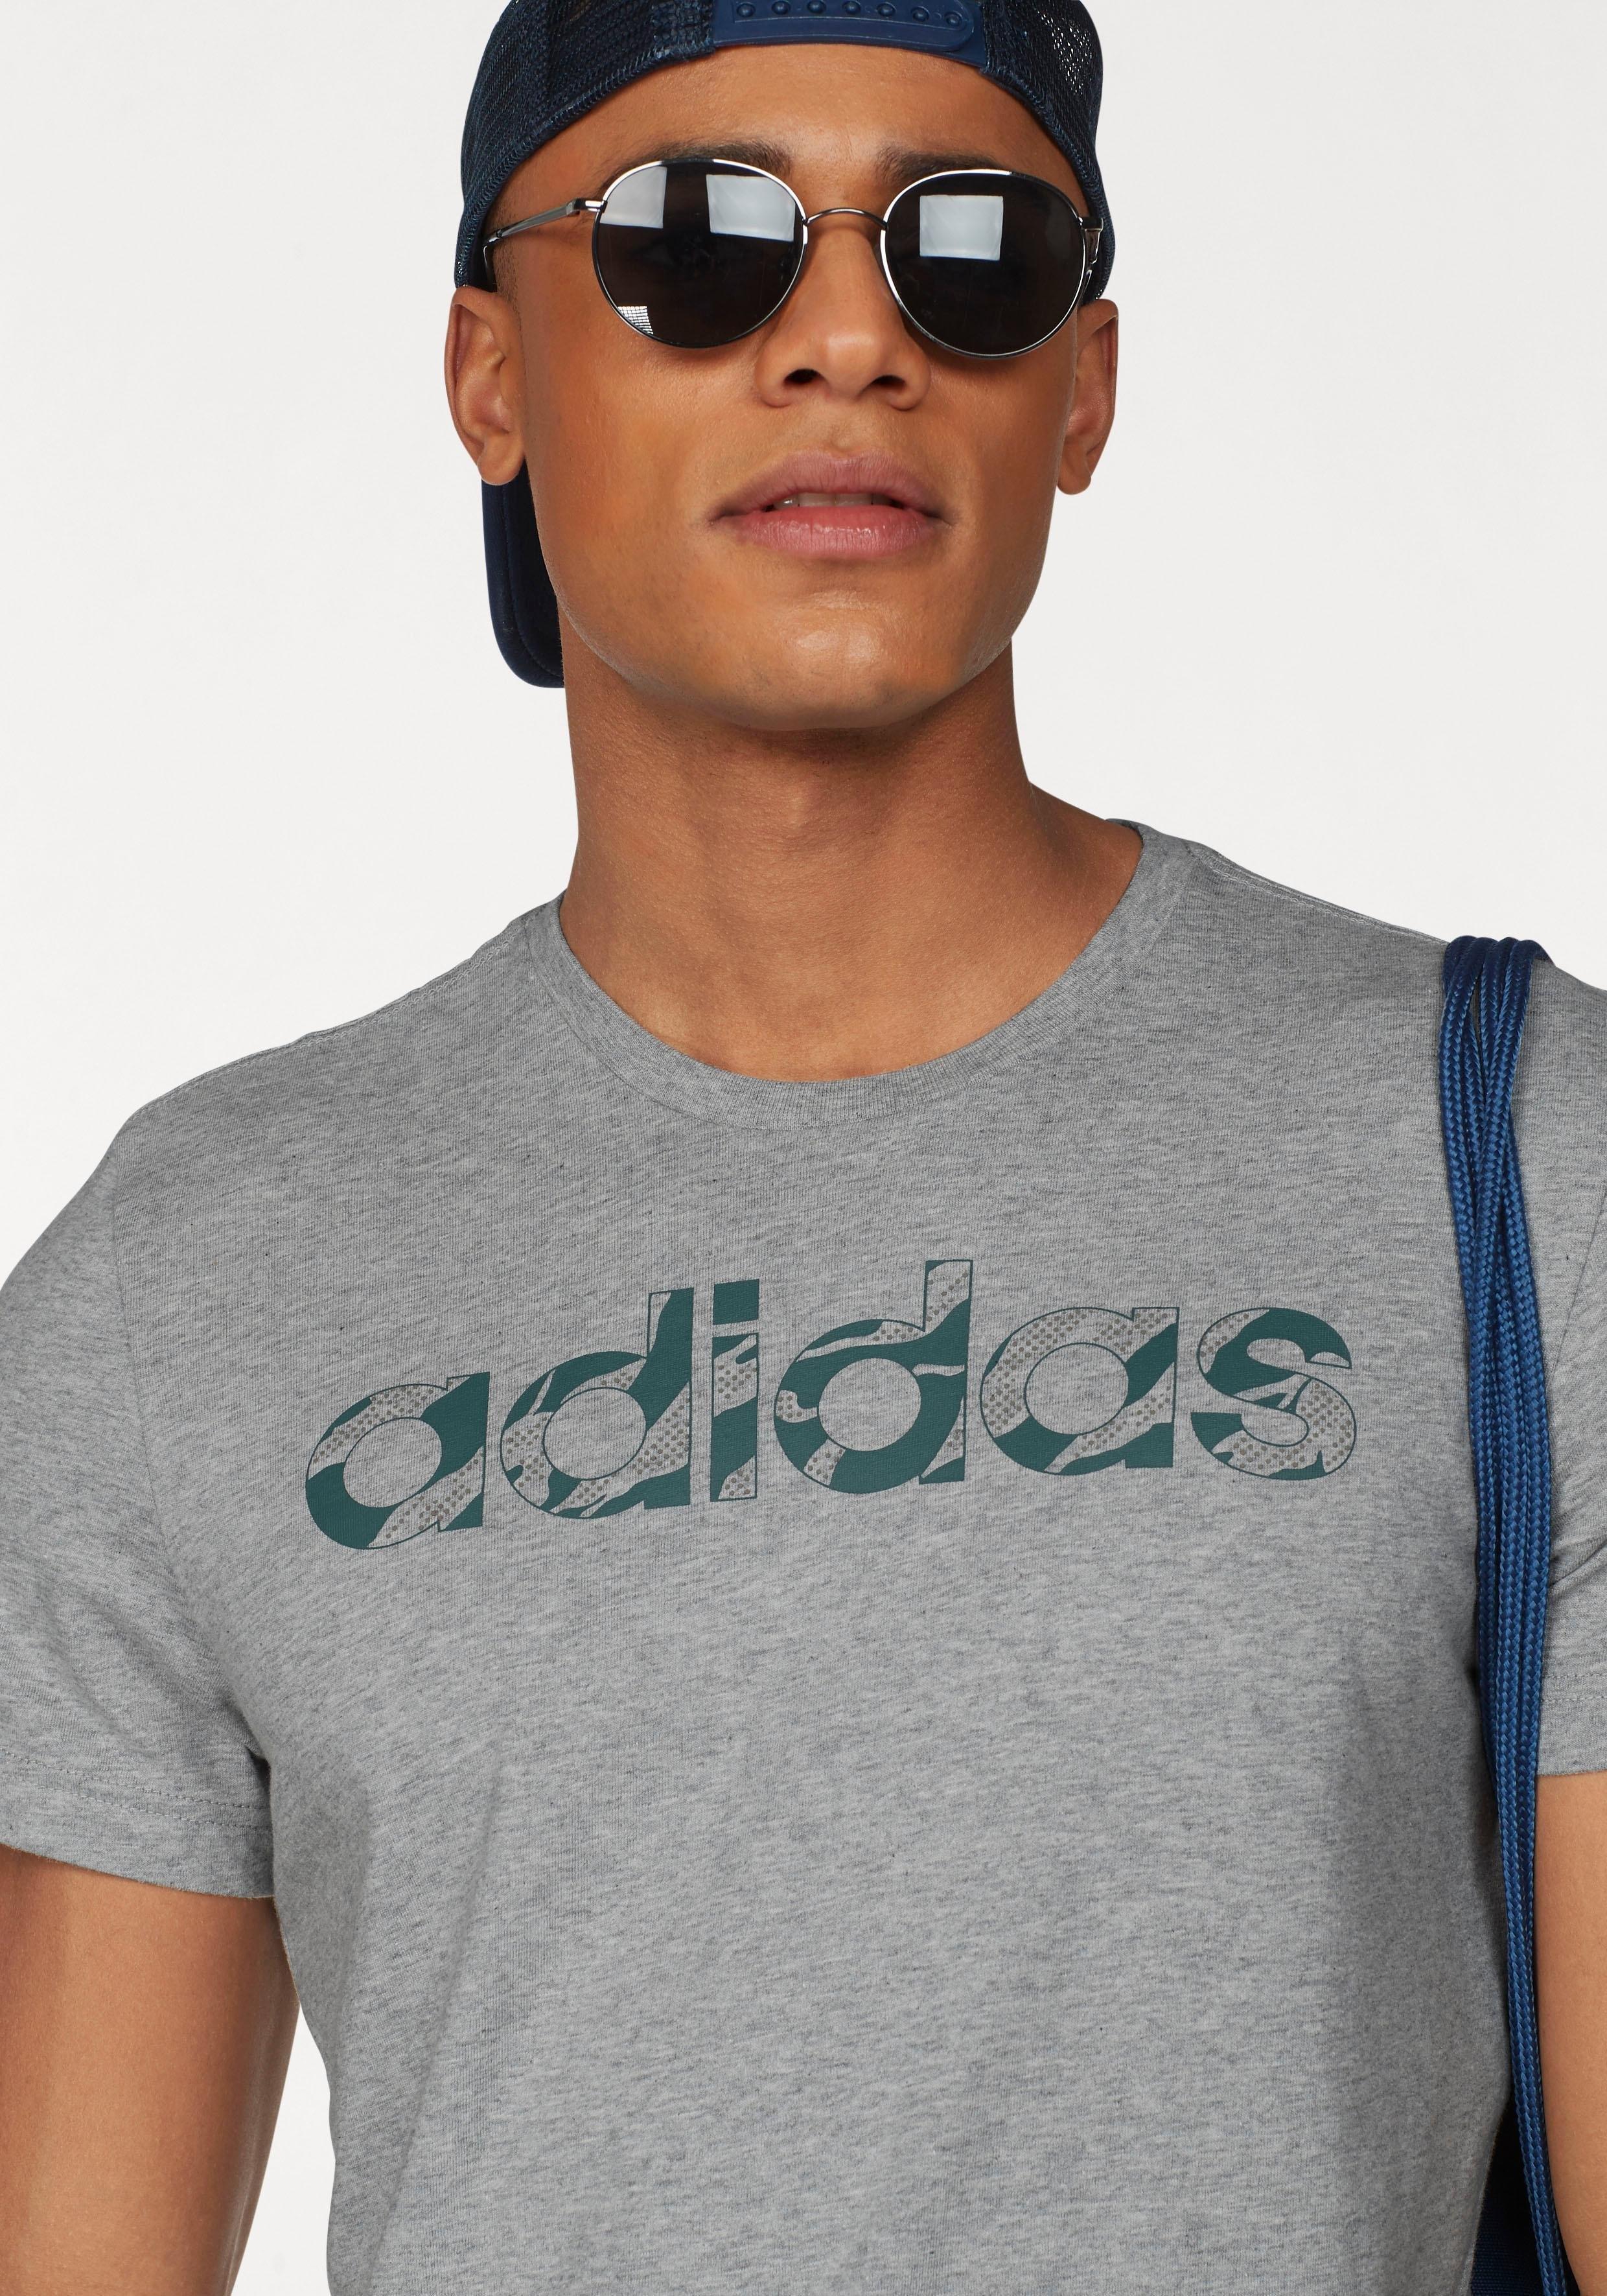 shirtlinear Makkelijk Performance T Adidas Camo Gekocht b6gf7y